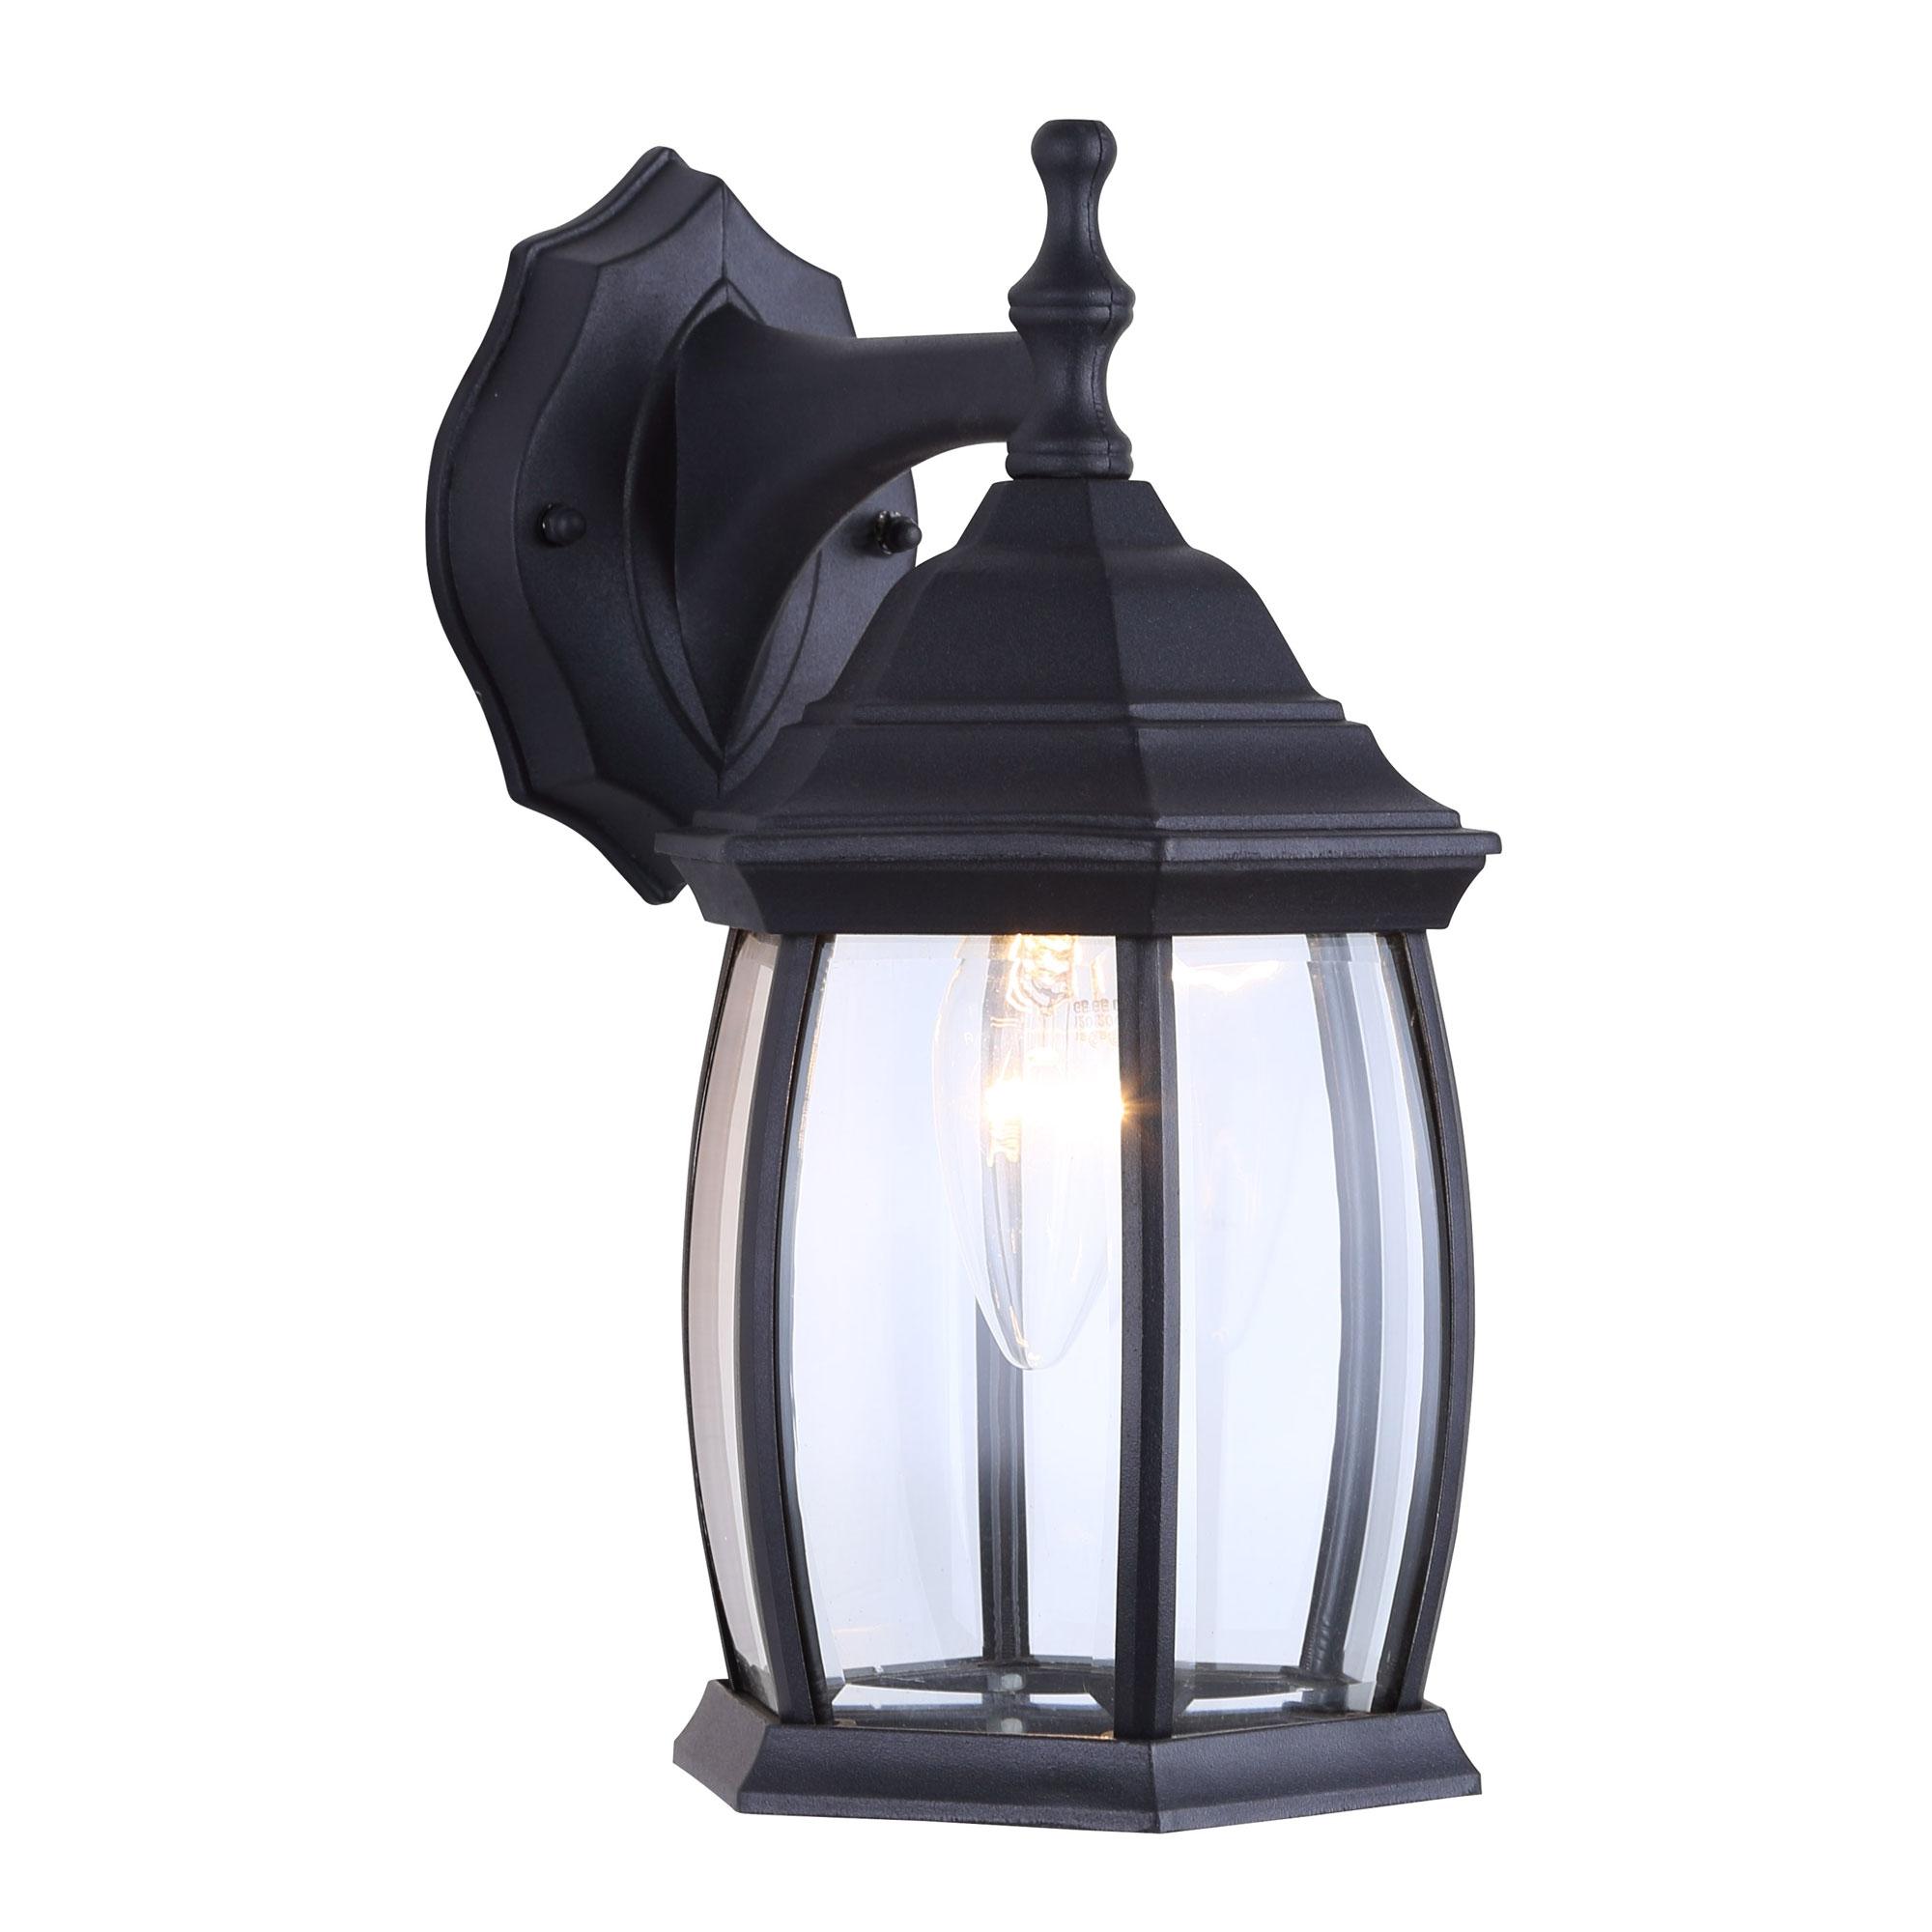 Merild Textured Black Wall Lanterns Pertaining To Latest One Light Outdoor Exterior Lantern Light Fixture Wall (View 7 of 20)